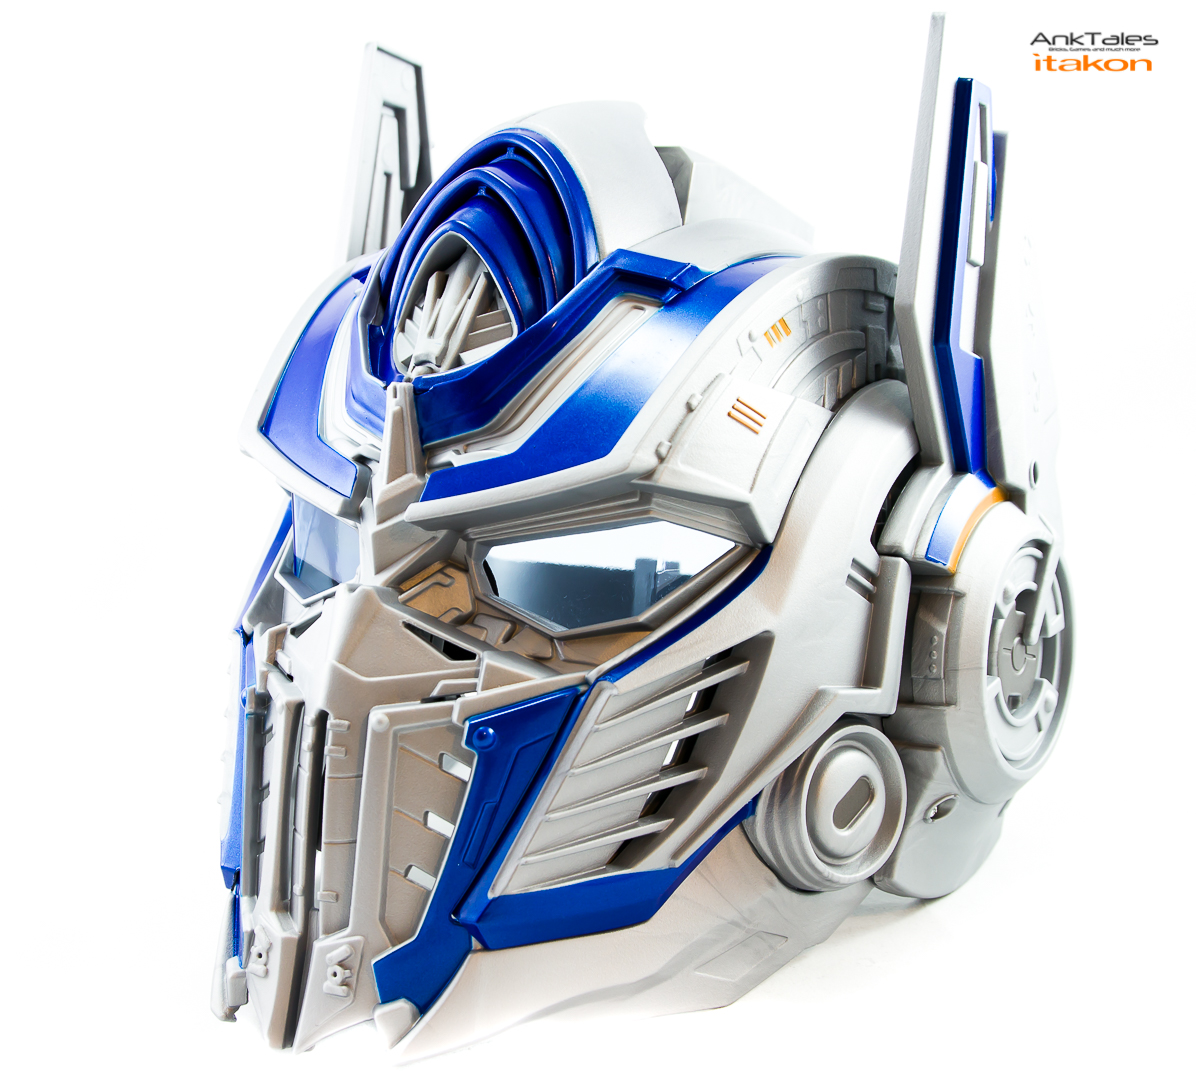 Link a Hasbro Optimus Prime helmet Anktales Itakon_0021